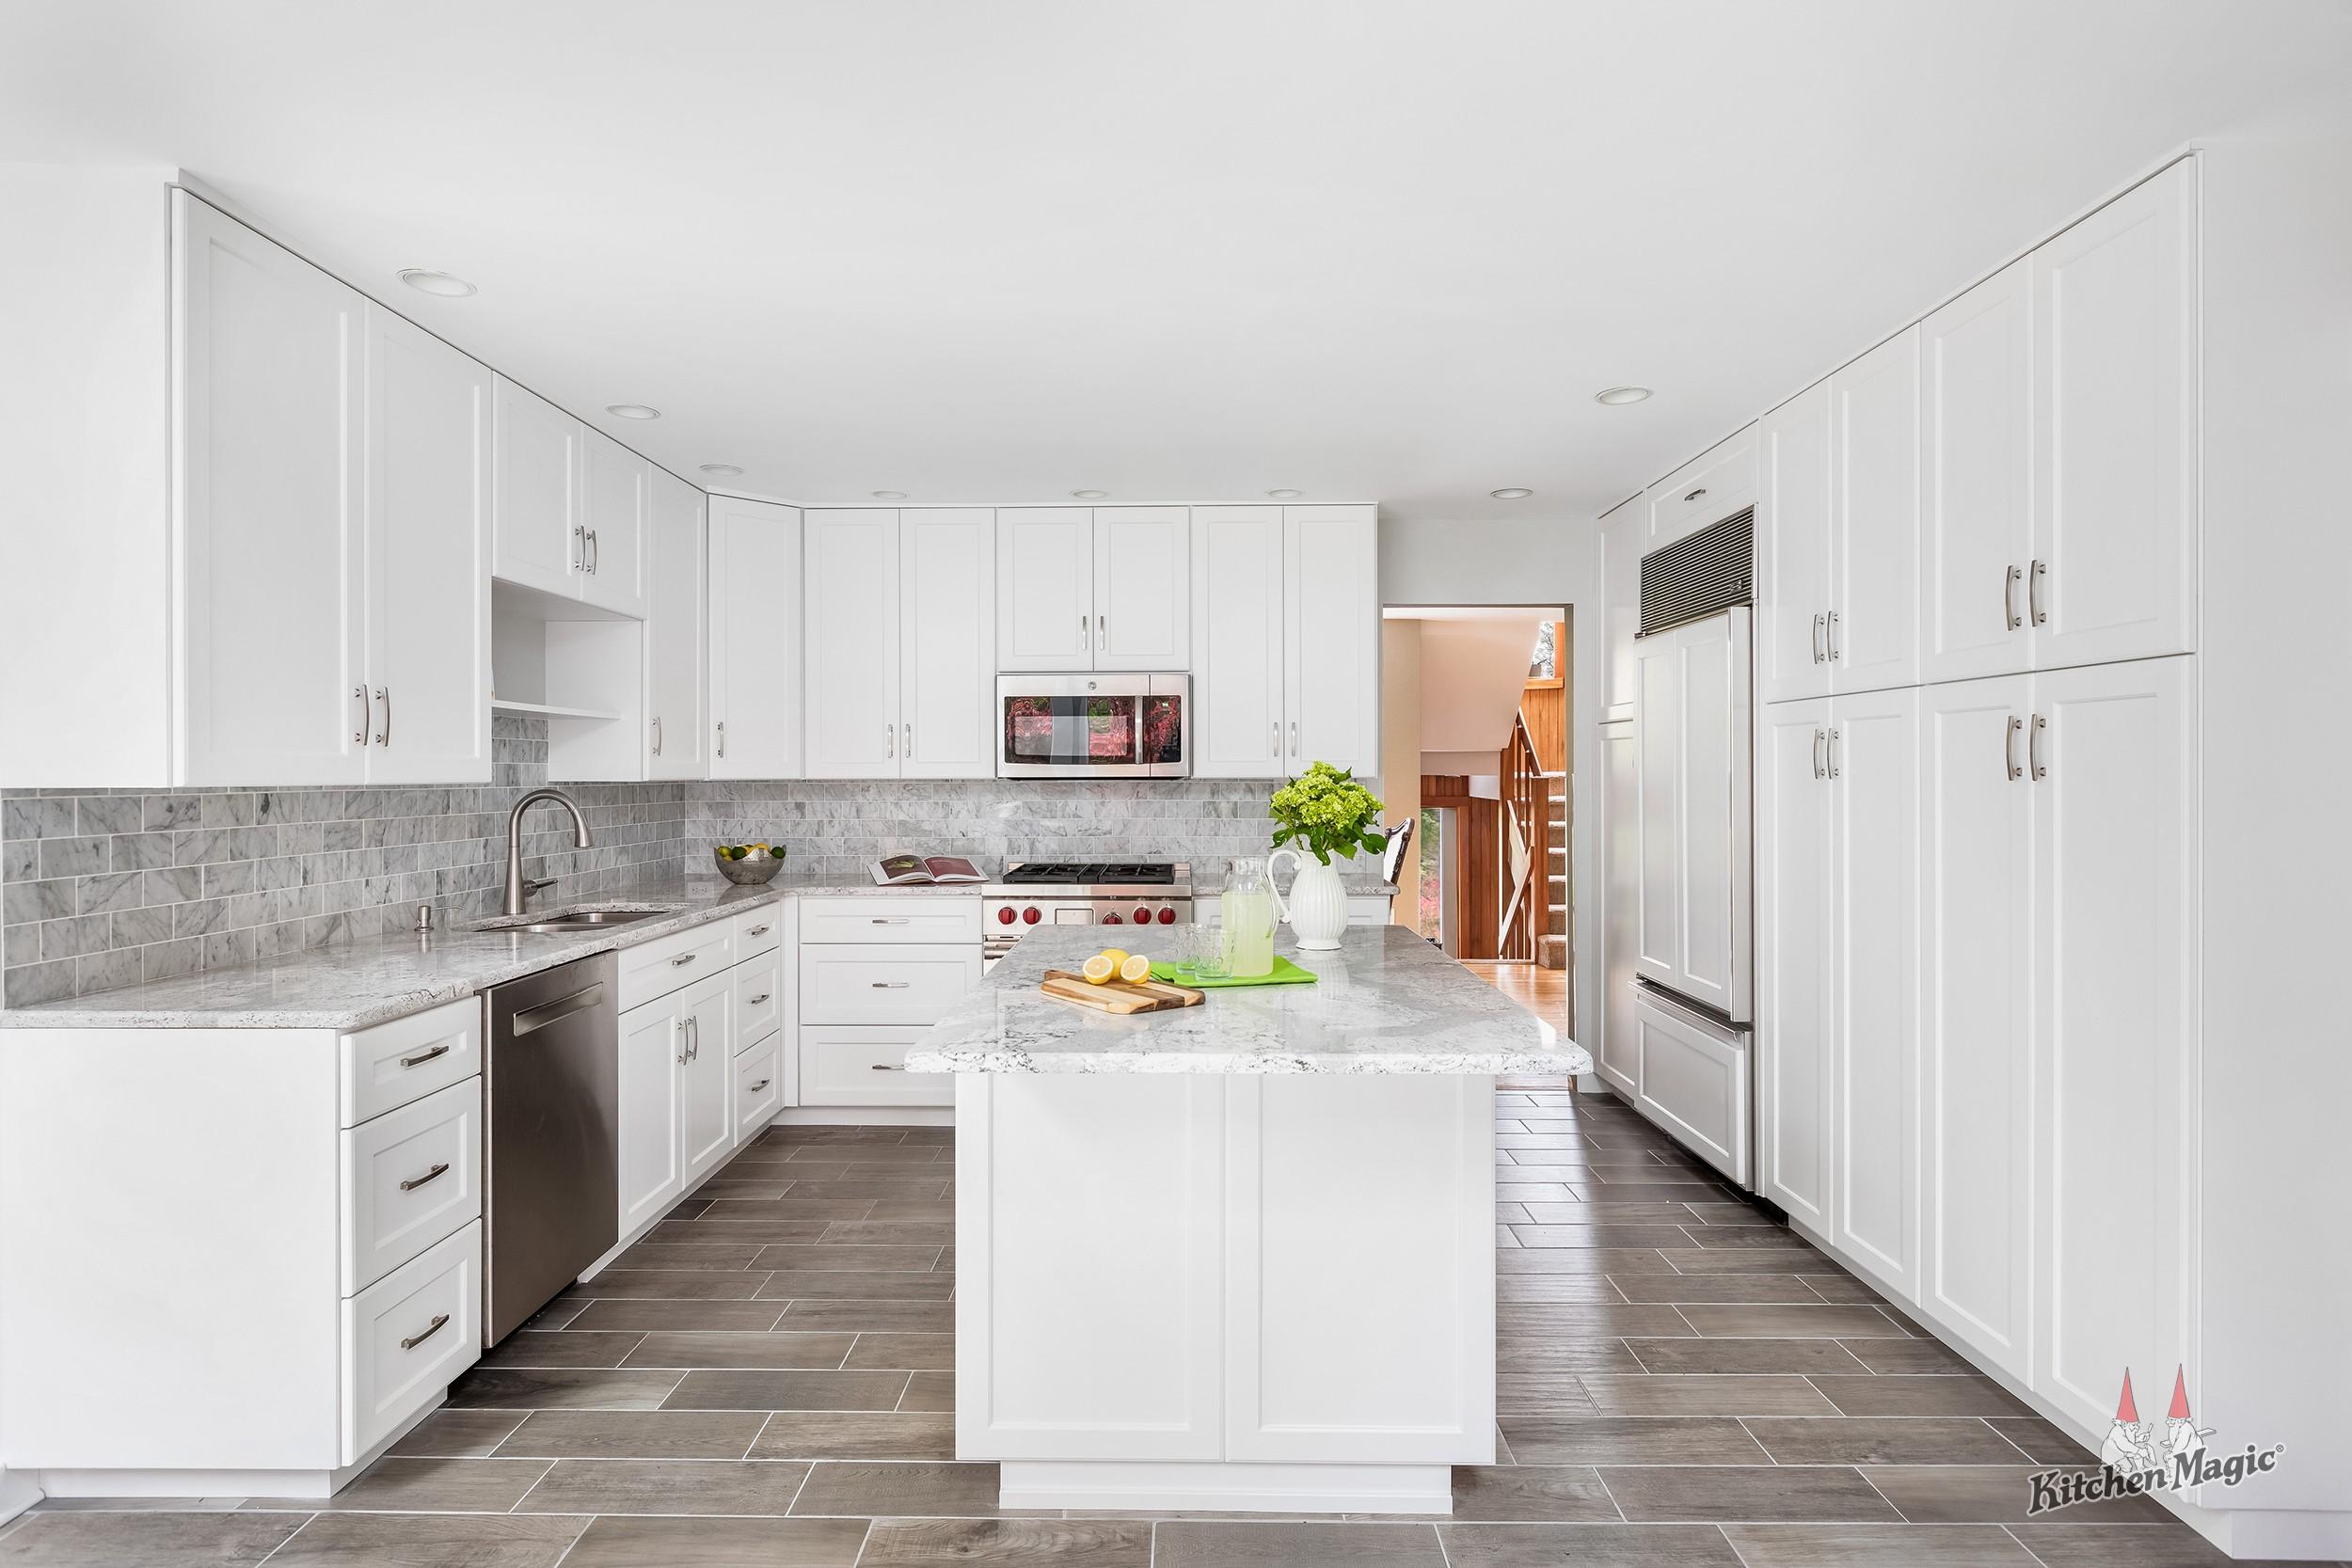 Kitchen Magic, Inc. | LinkedIn